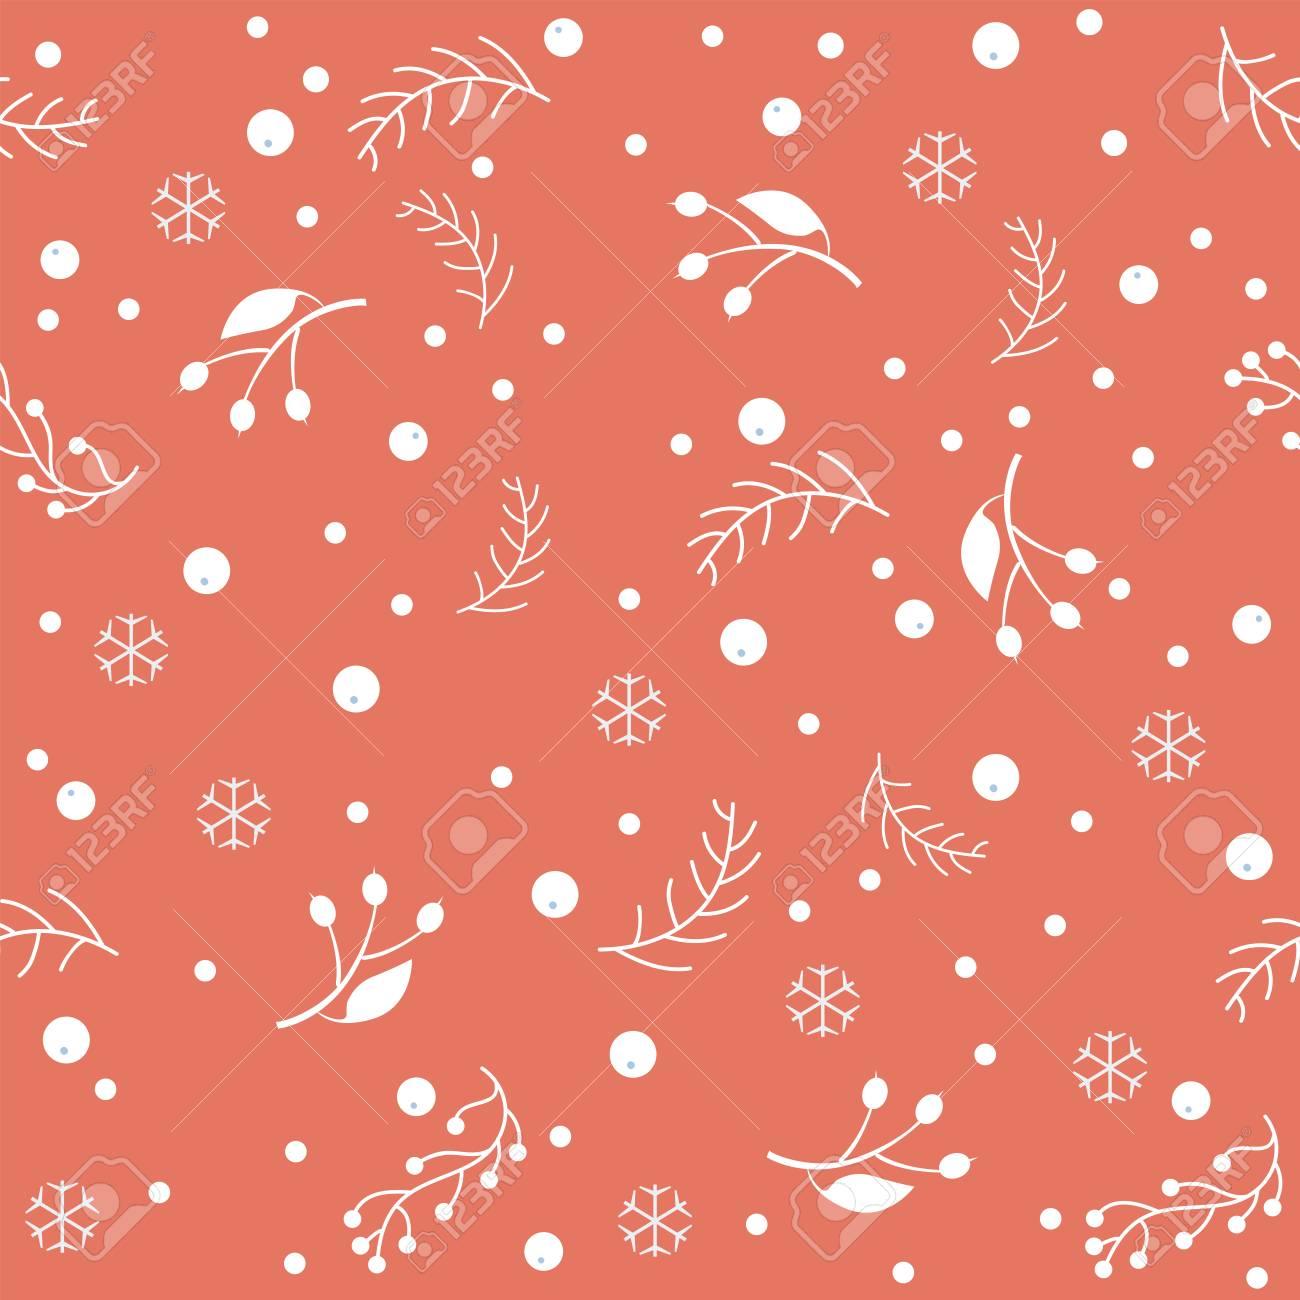 Christmas Texture.Stock Illustration